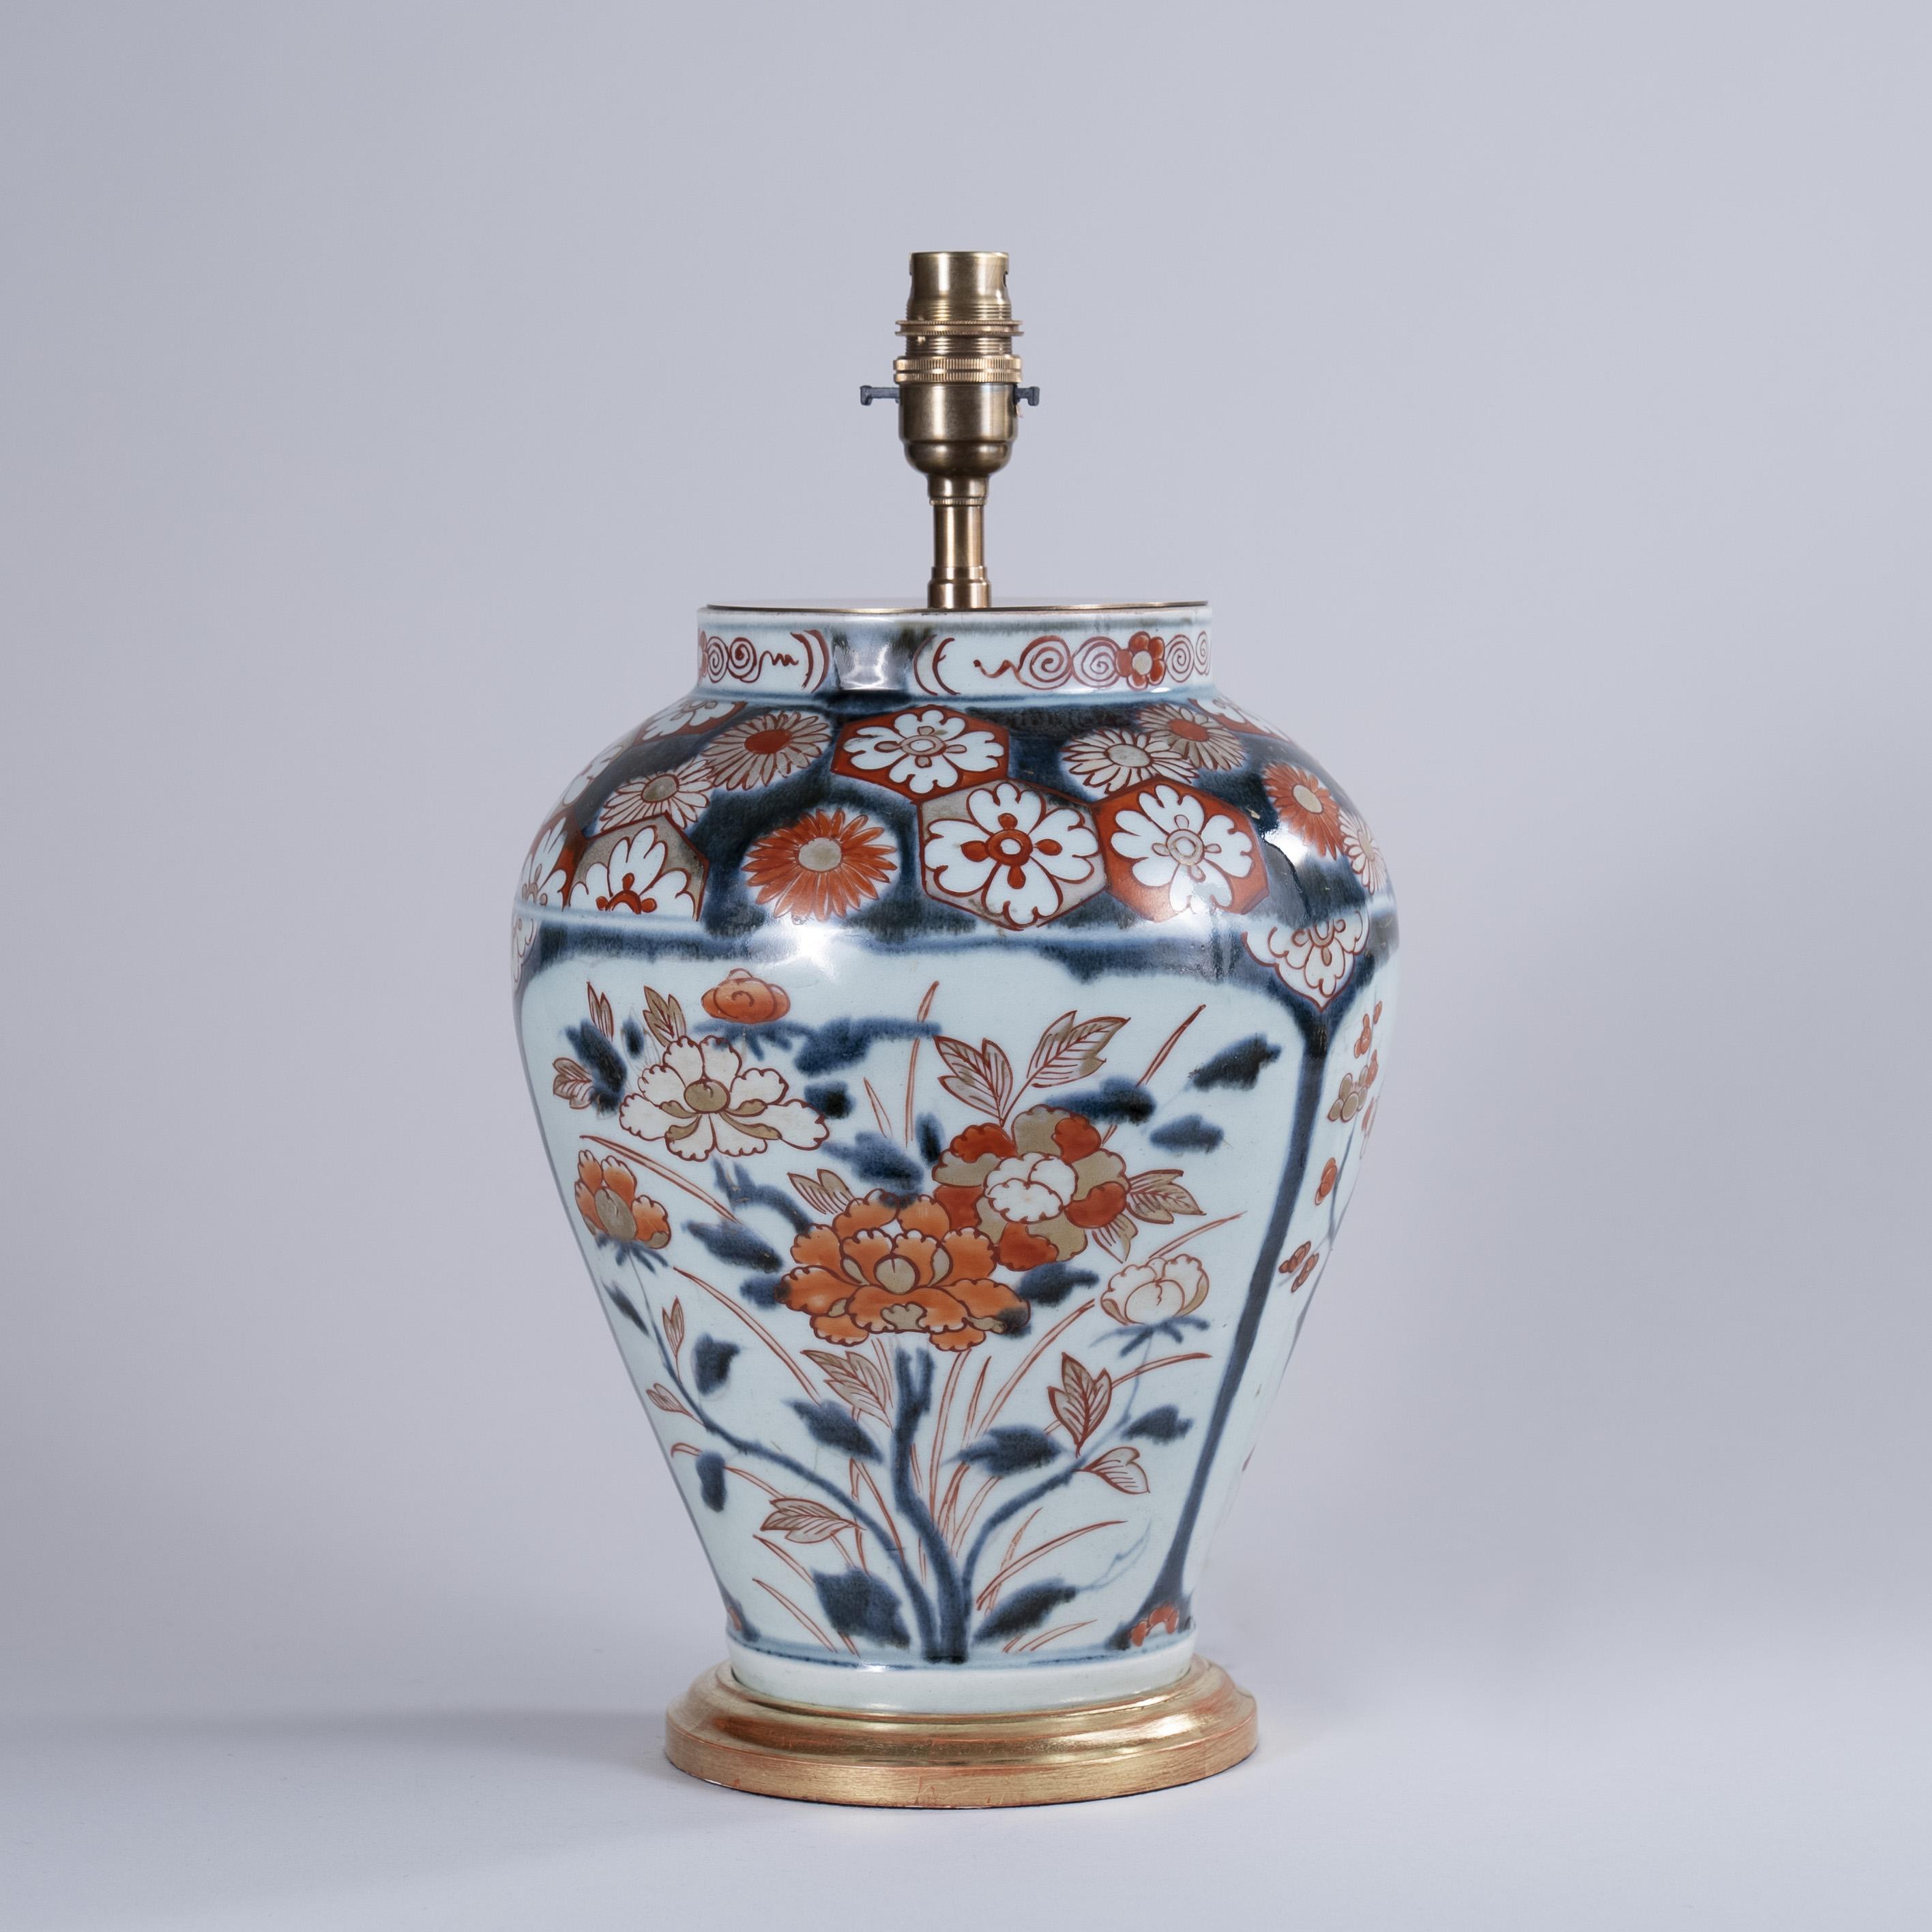 Early 18th century Japanese Imari vase as a Lamp